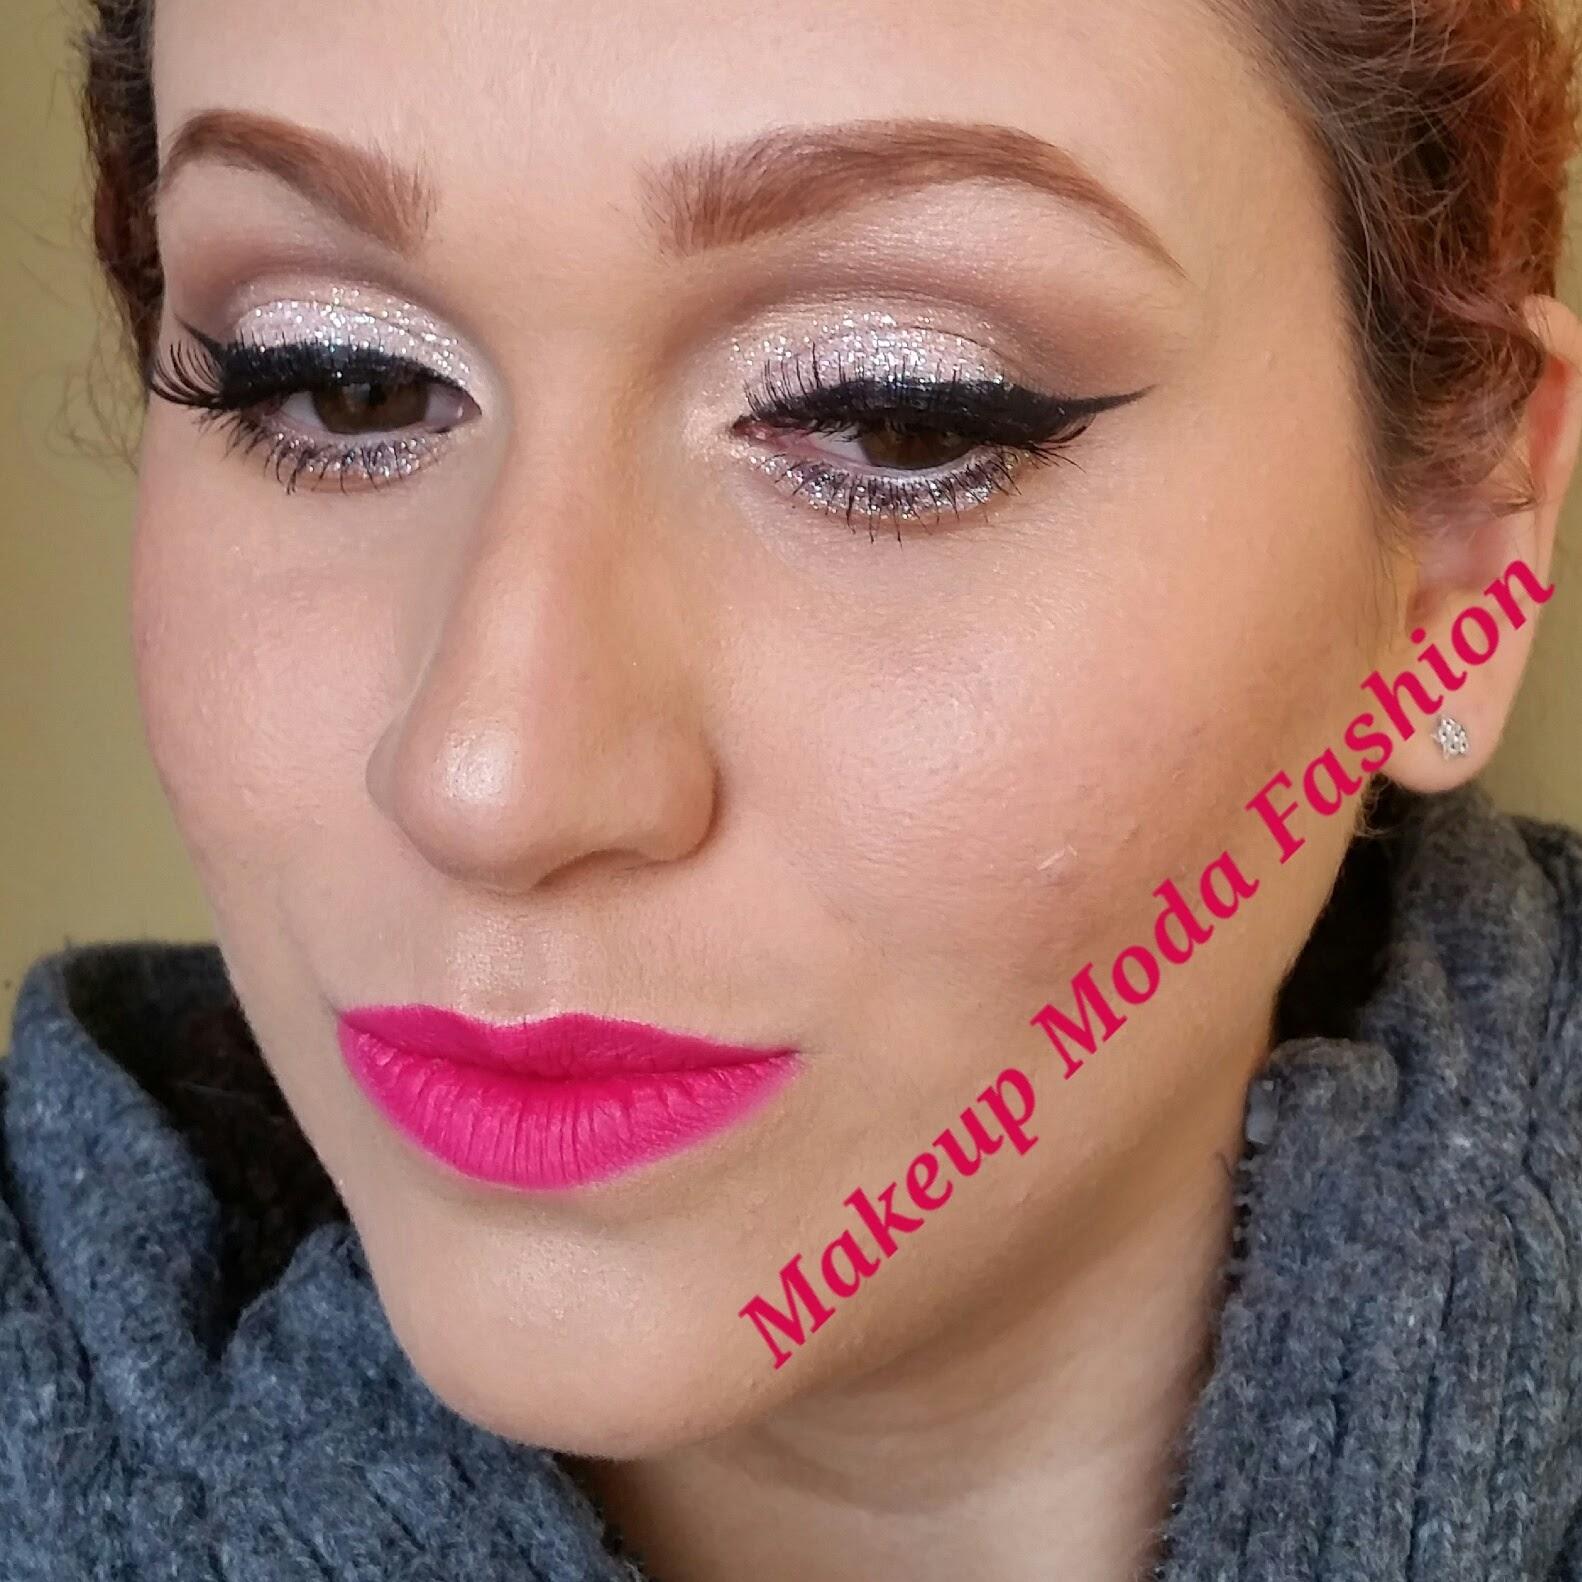 Preferenza gennaio 2016 - Makeup Moda Fashion By Raquel GN21